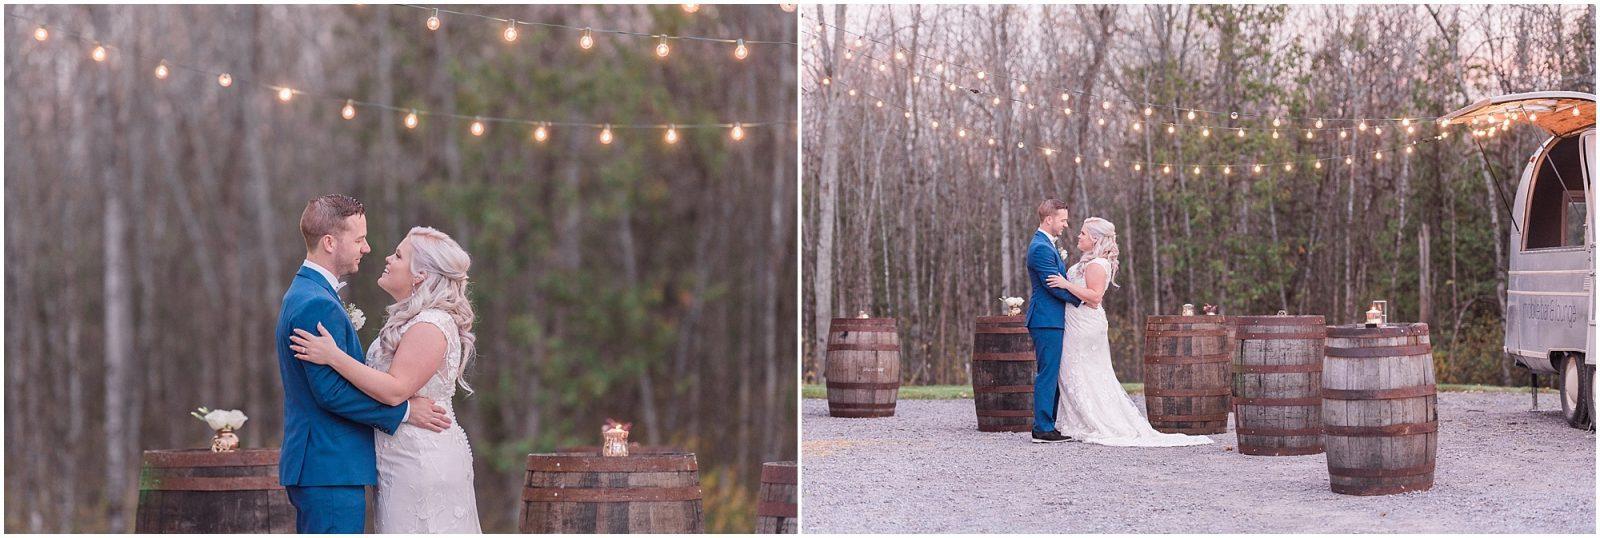 0081 Bethany and Luc - Fall Backyard Ottawa Wedding - Copper and Navy - PhotosbyEmmaH.jpg